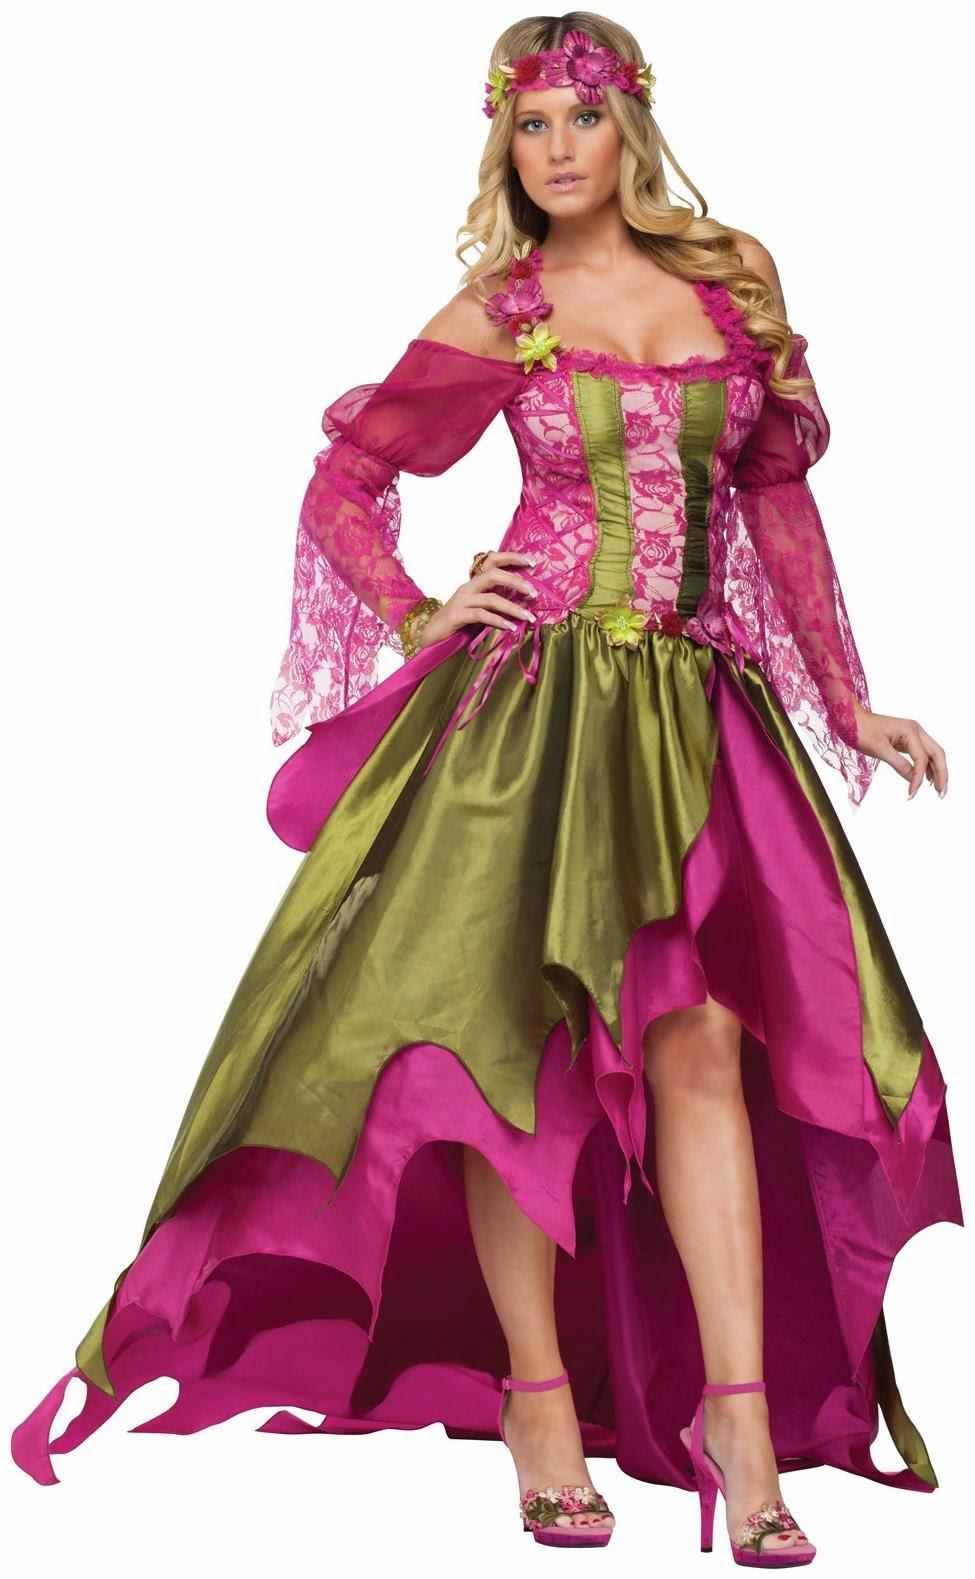 http://www.partybell.com/p-30265-renaissance-nymph-adult-costume.aspx